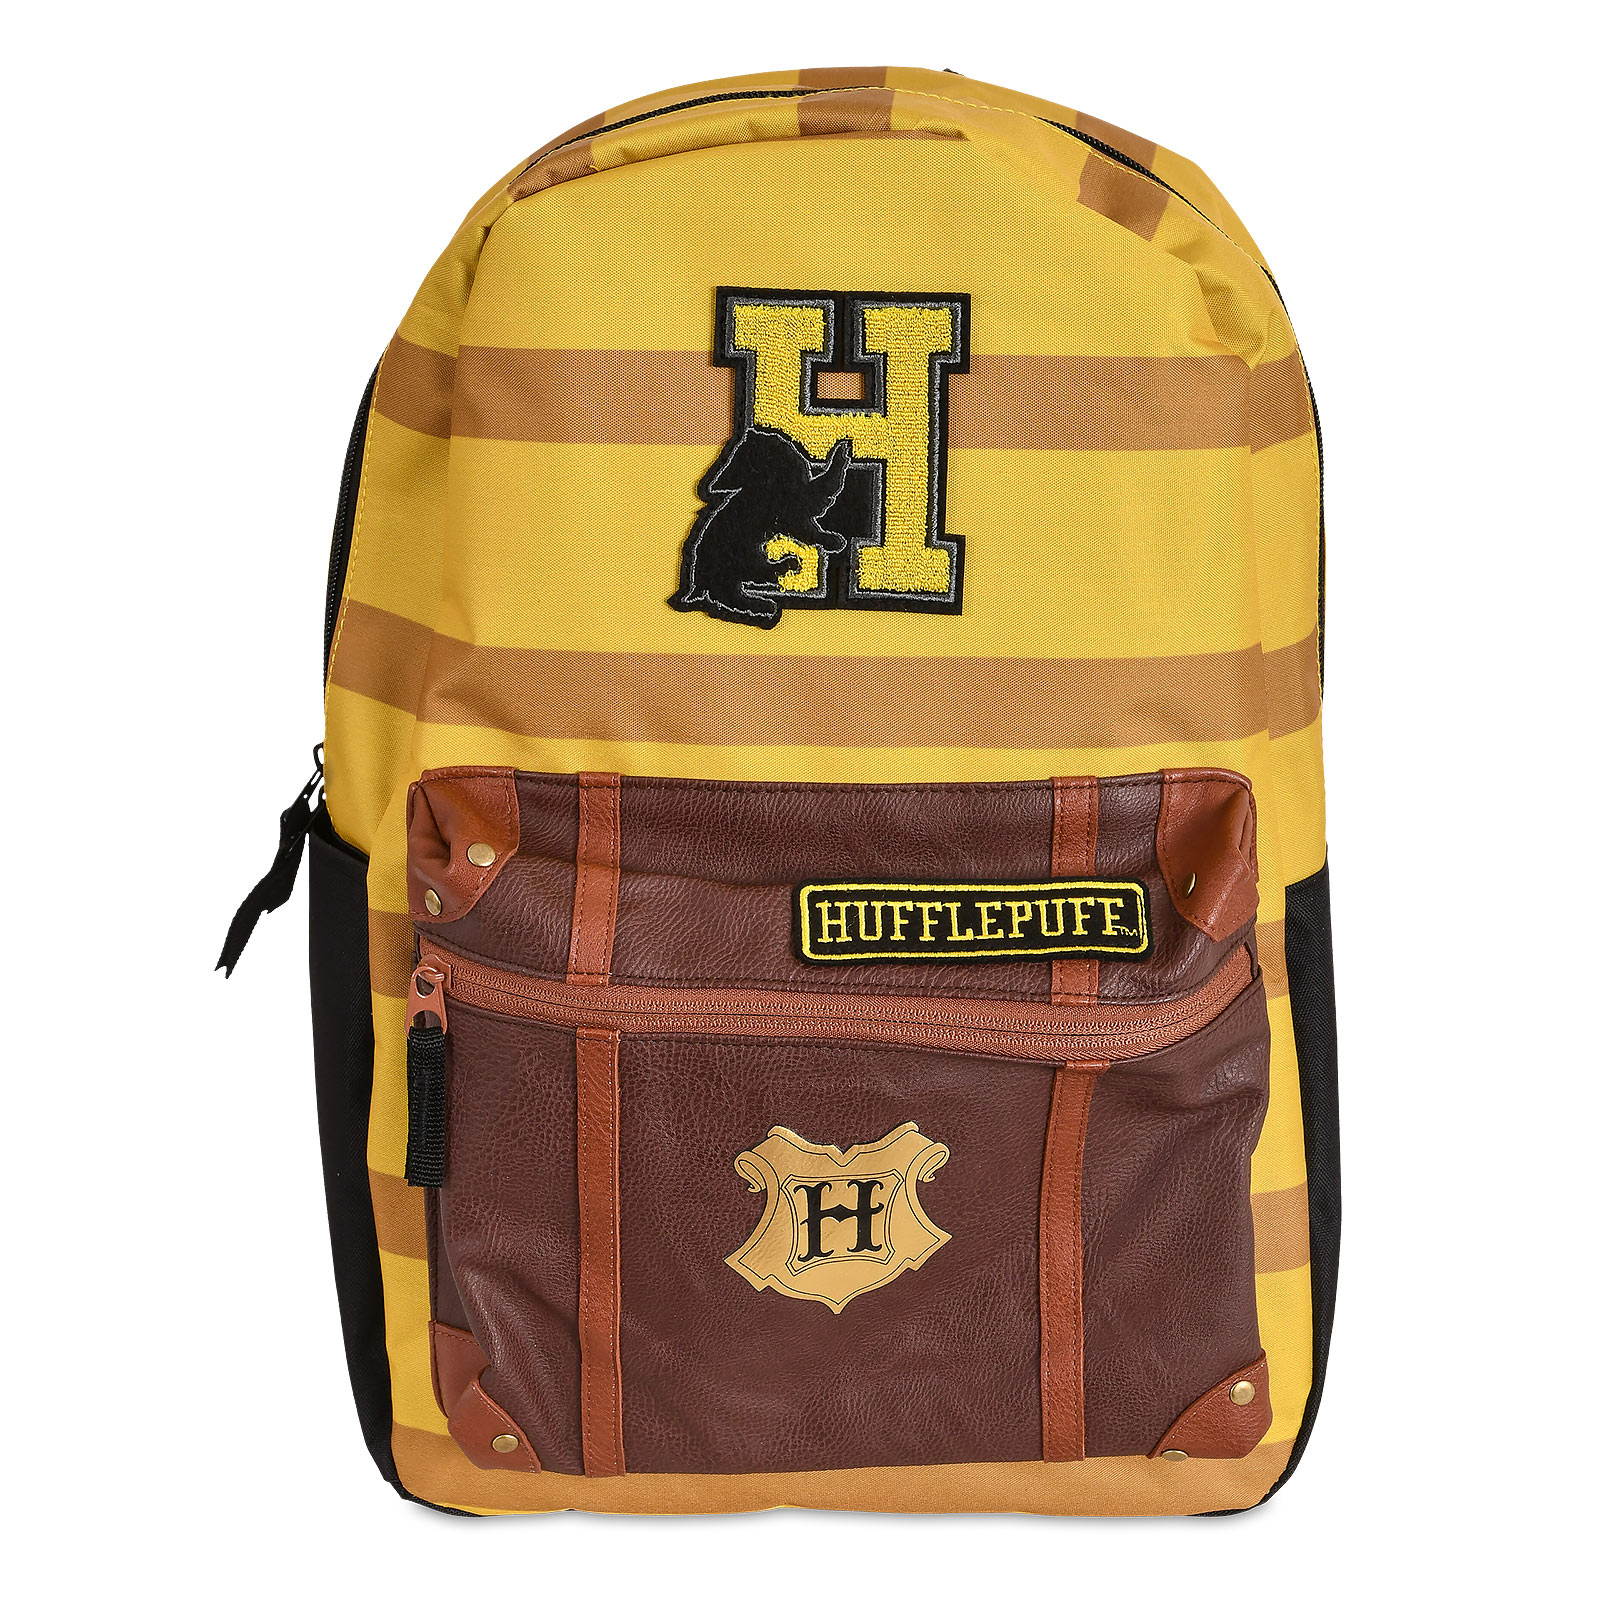 Harry Potter - Hufflepuff School Rucksack